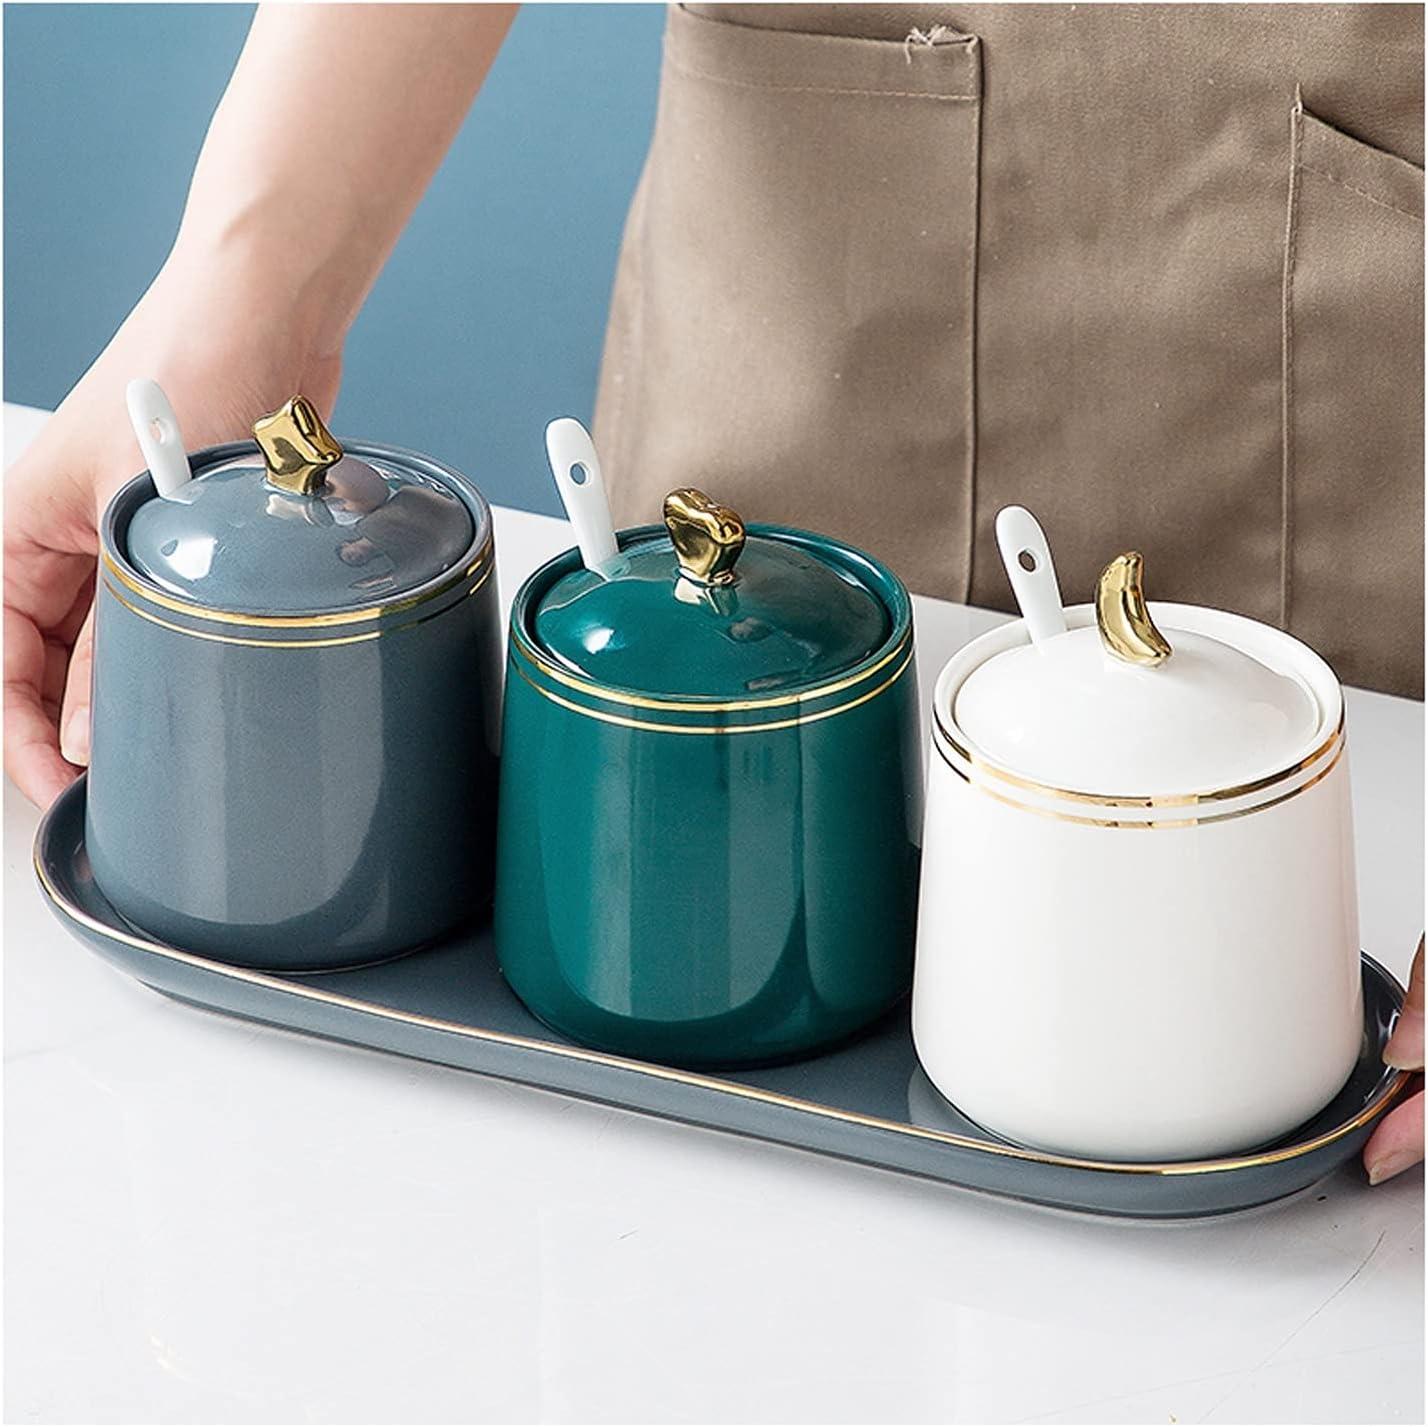 Ranking TOP3 Condiment Jar Spice Container Max 77% OFF Ceramic Sugar Pots Bowls